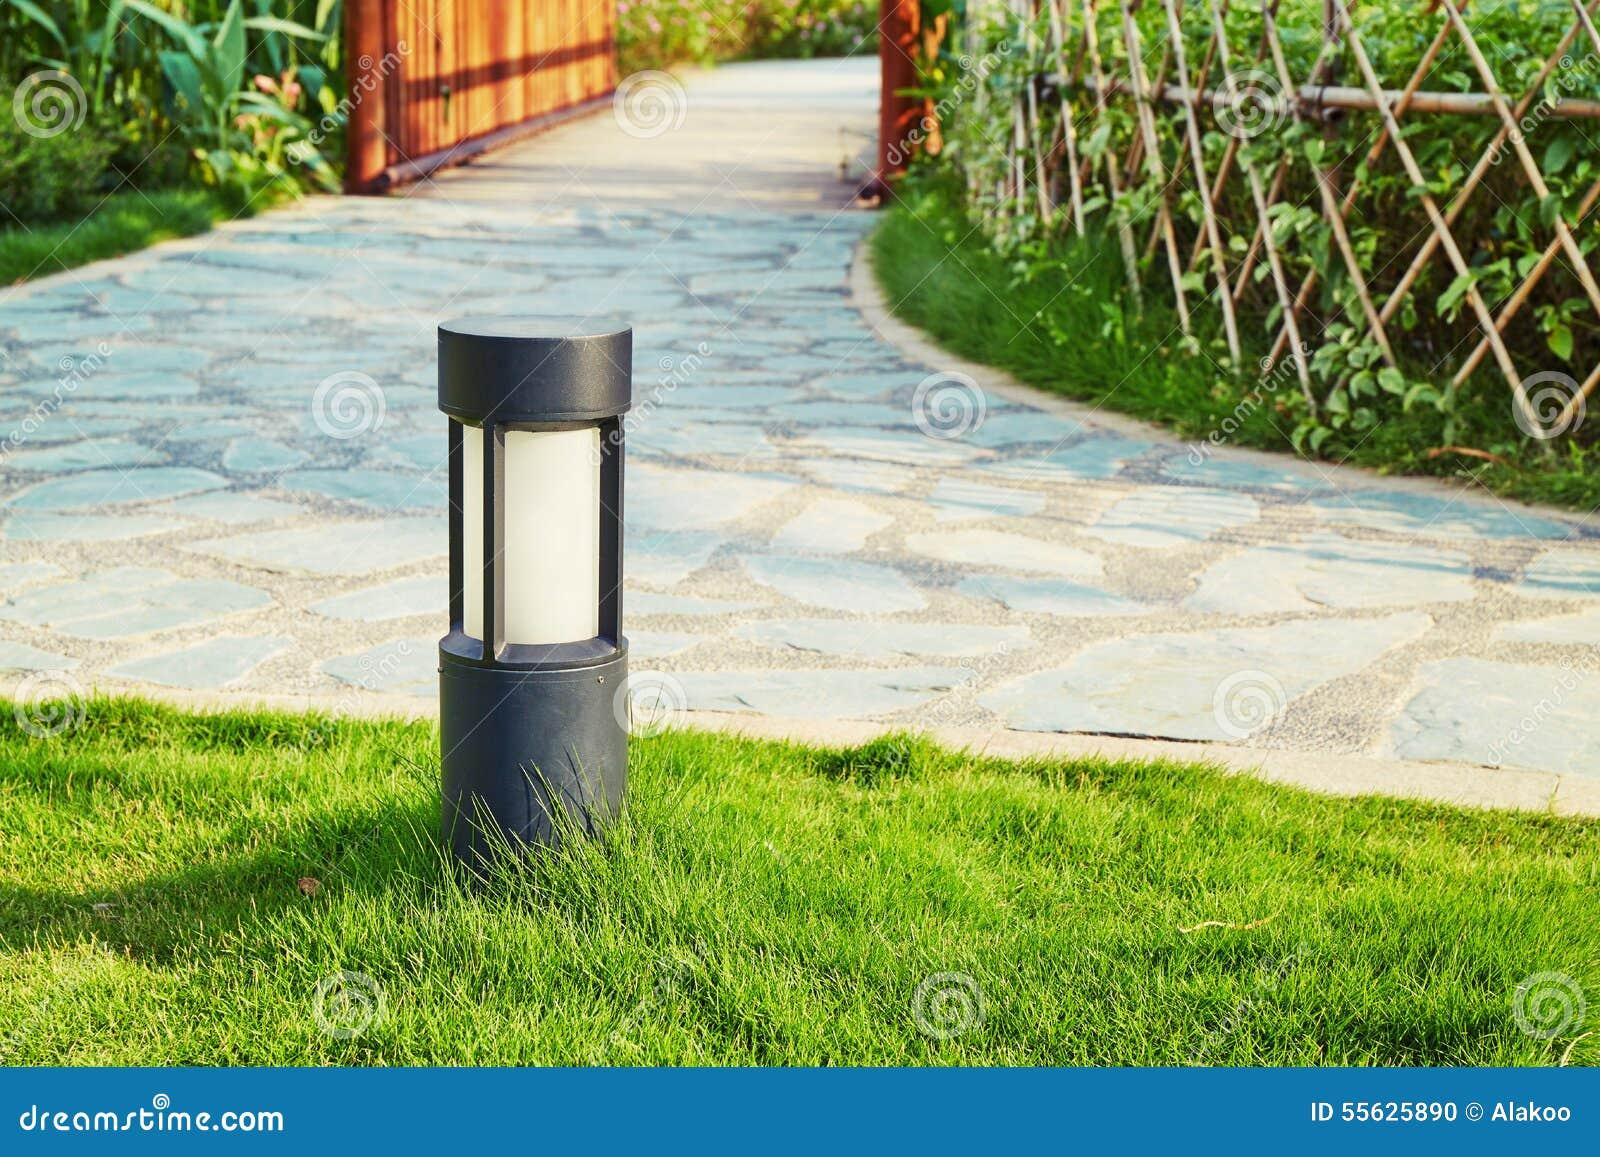 Lawn Lamp Garden Light Outdoor Landscape Lighting Stock